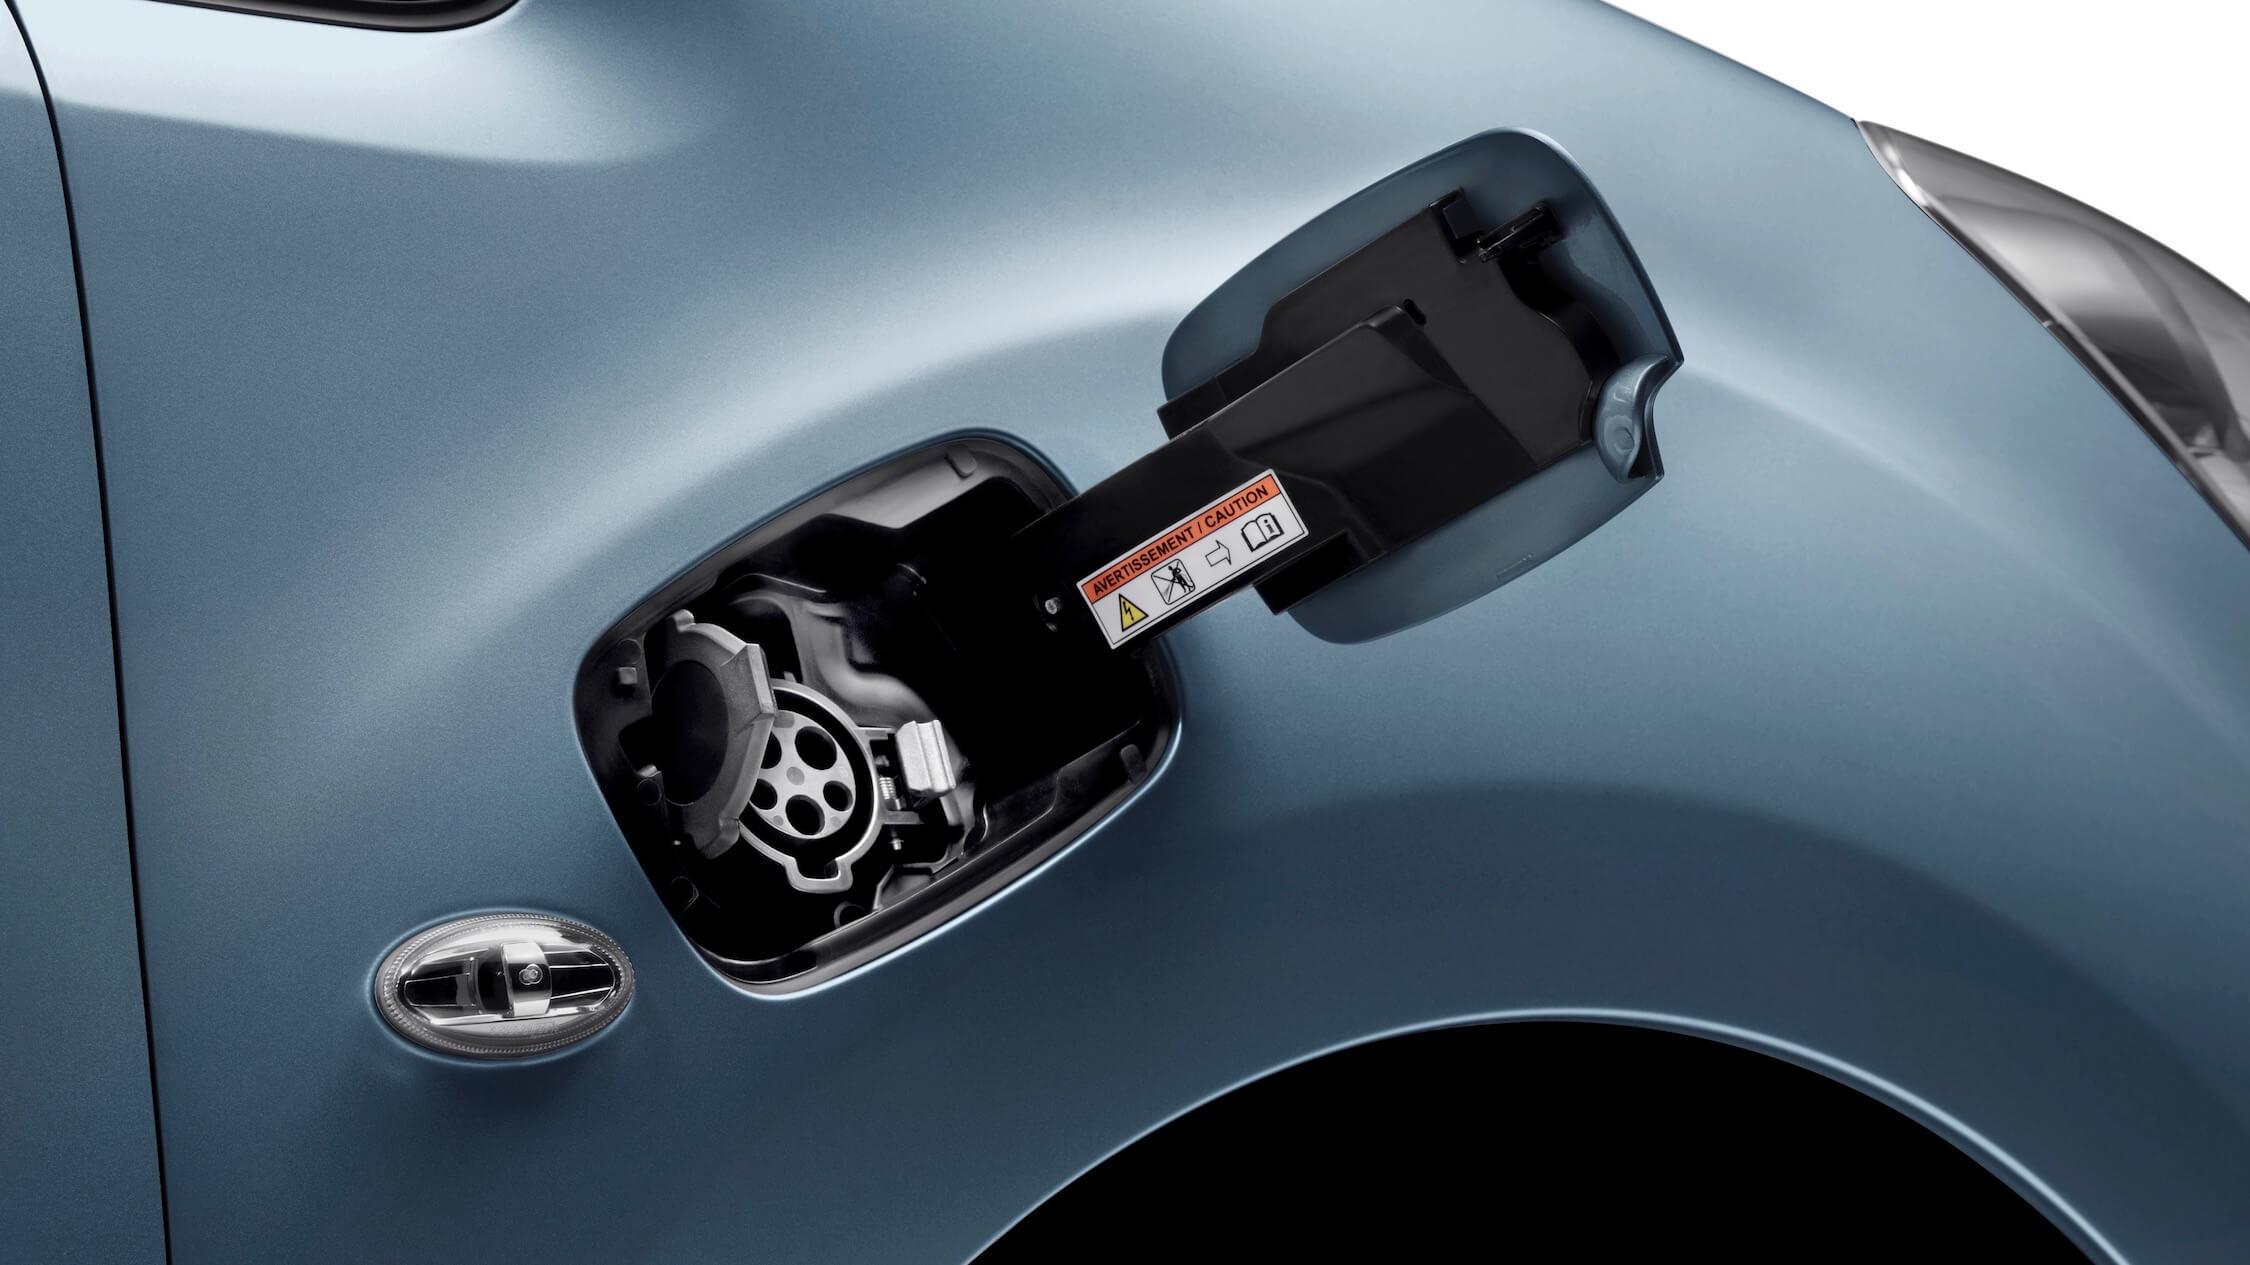 Peugeot Partner Electric type 1